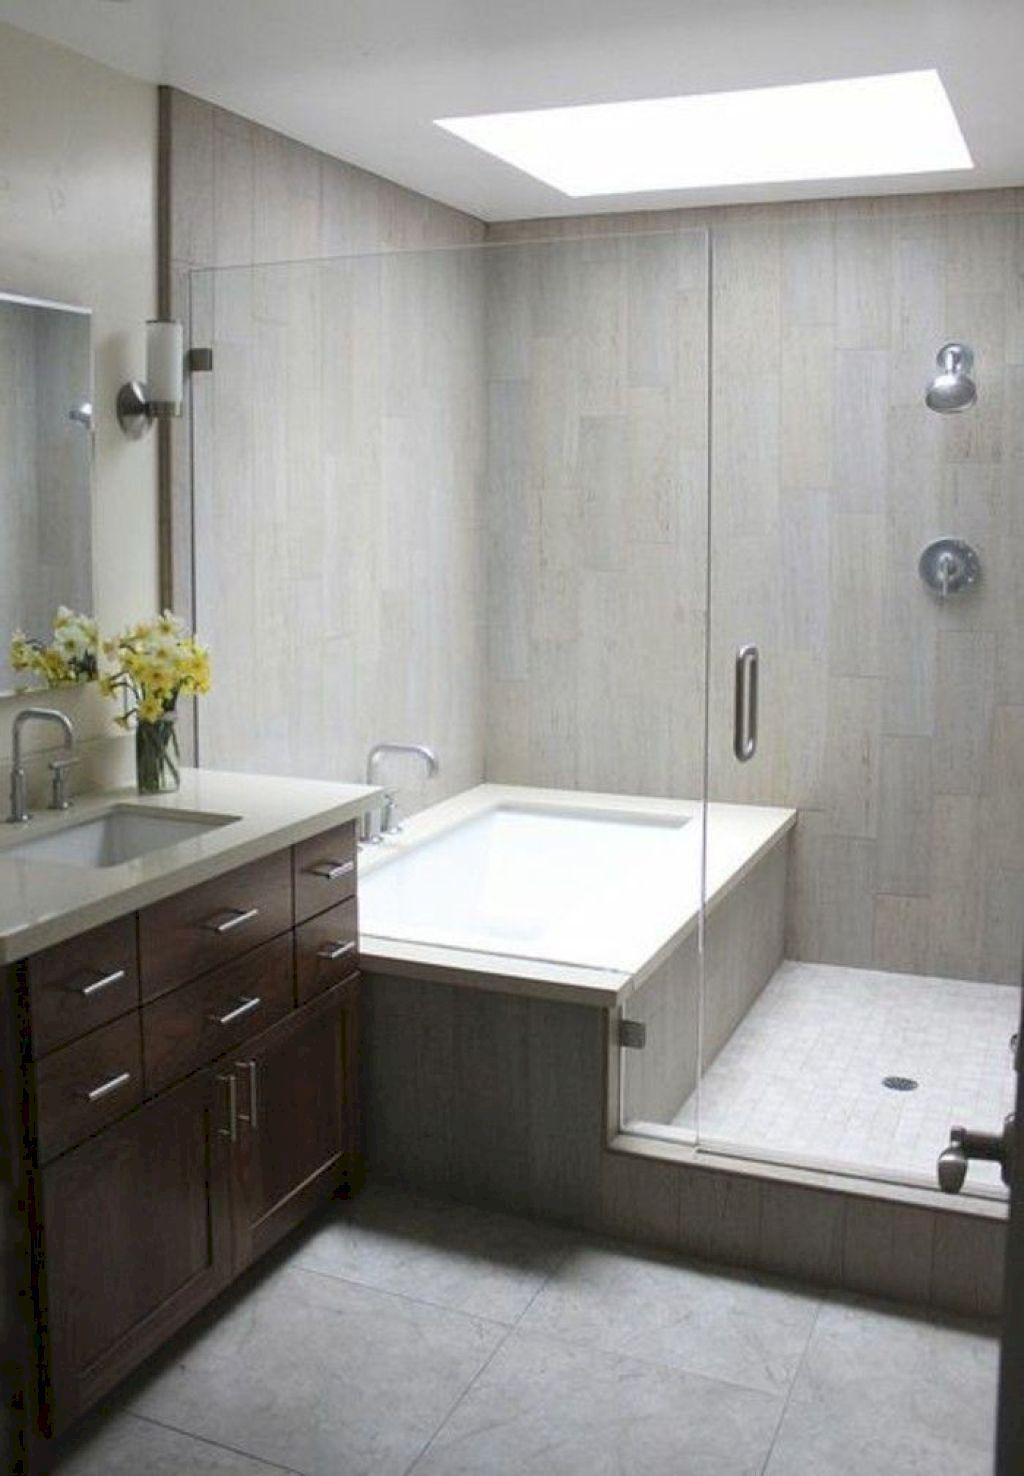 85 Wonderful Design For Your Bathroom Ideas Result Best Bathroom Designs Bathroom Remodel Master Bathroom Remodel Designs